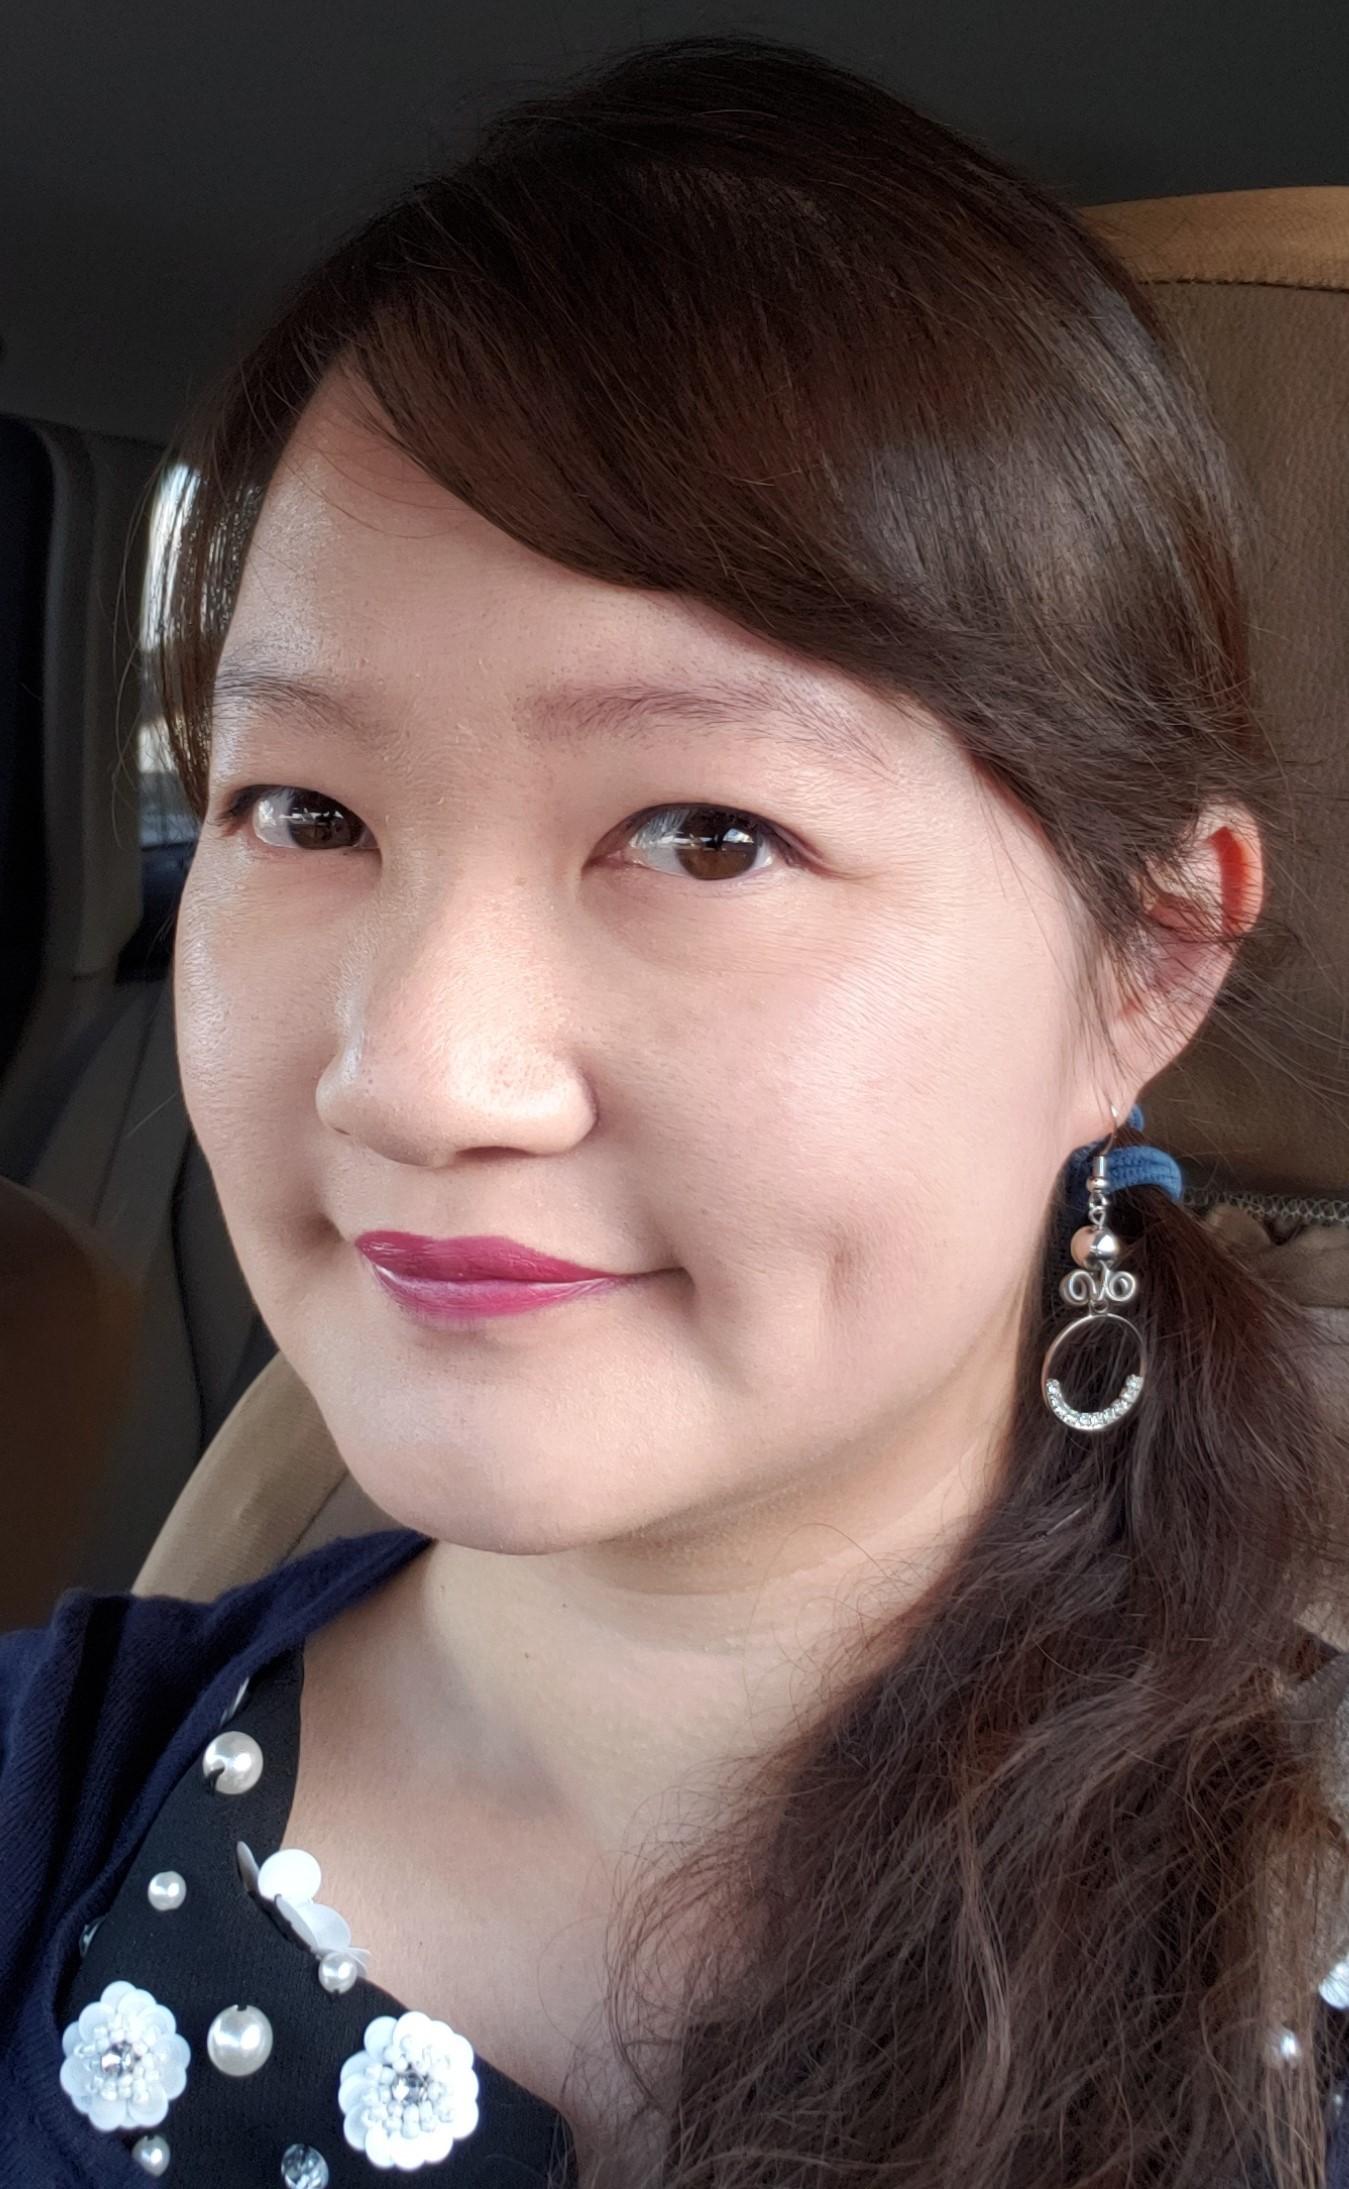 Vanessa Li - Hear Her Story